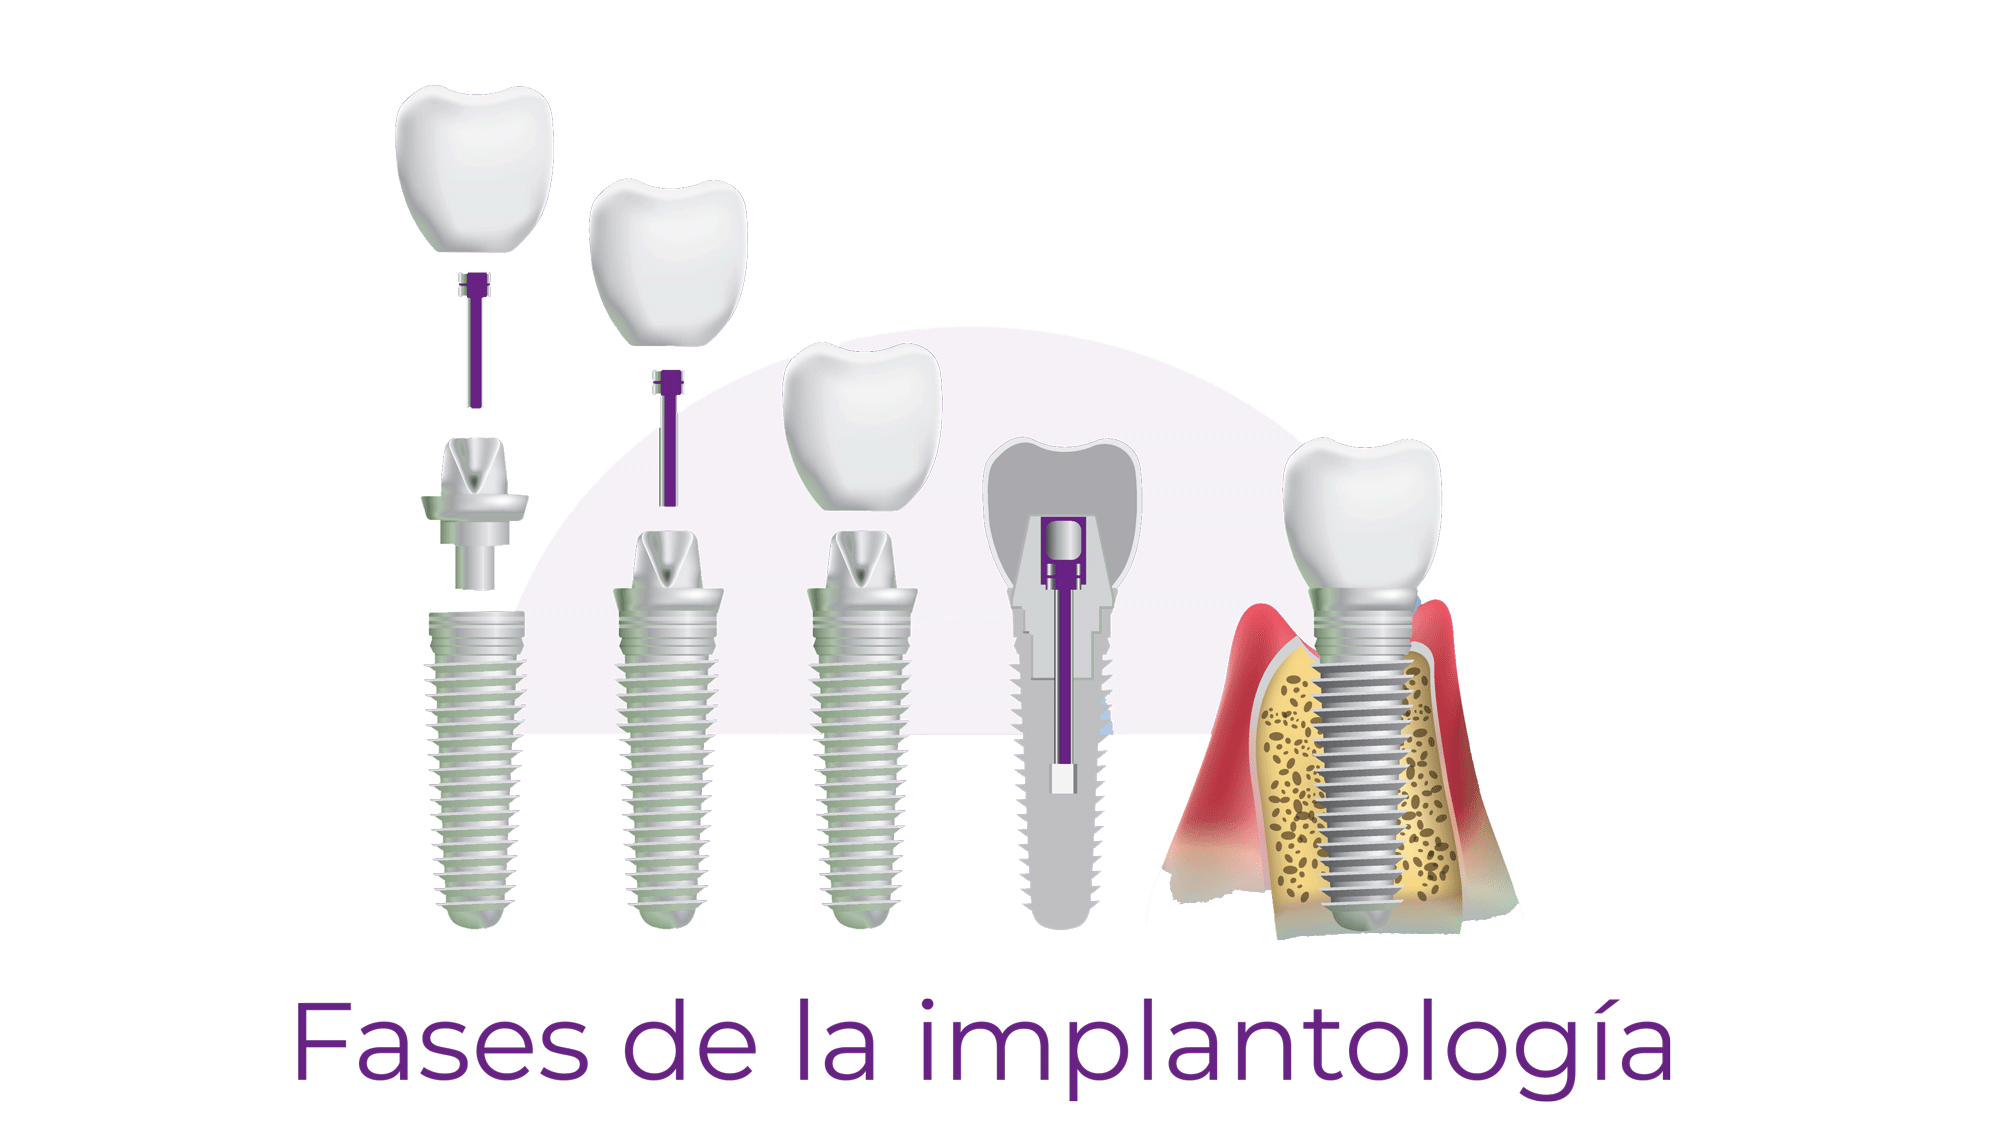 Fases implantología dental Rubí